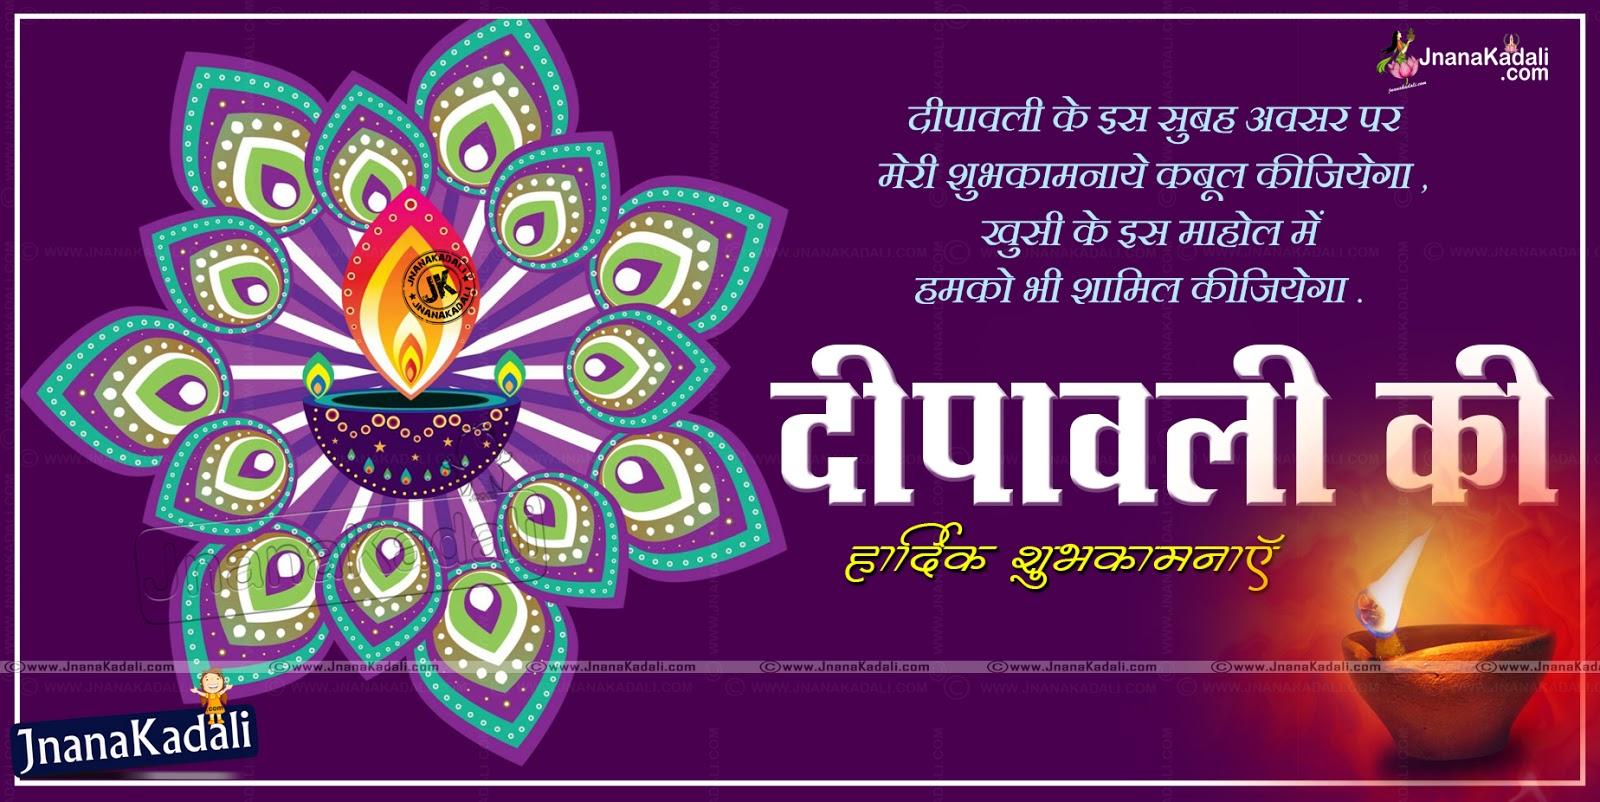 Here Is Telugu Diwali Kavithalu Shubhakankshalu Messages, - Diwali Wishes With Rangoli - HD Wallpaper